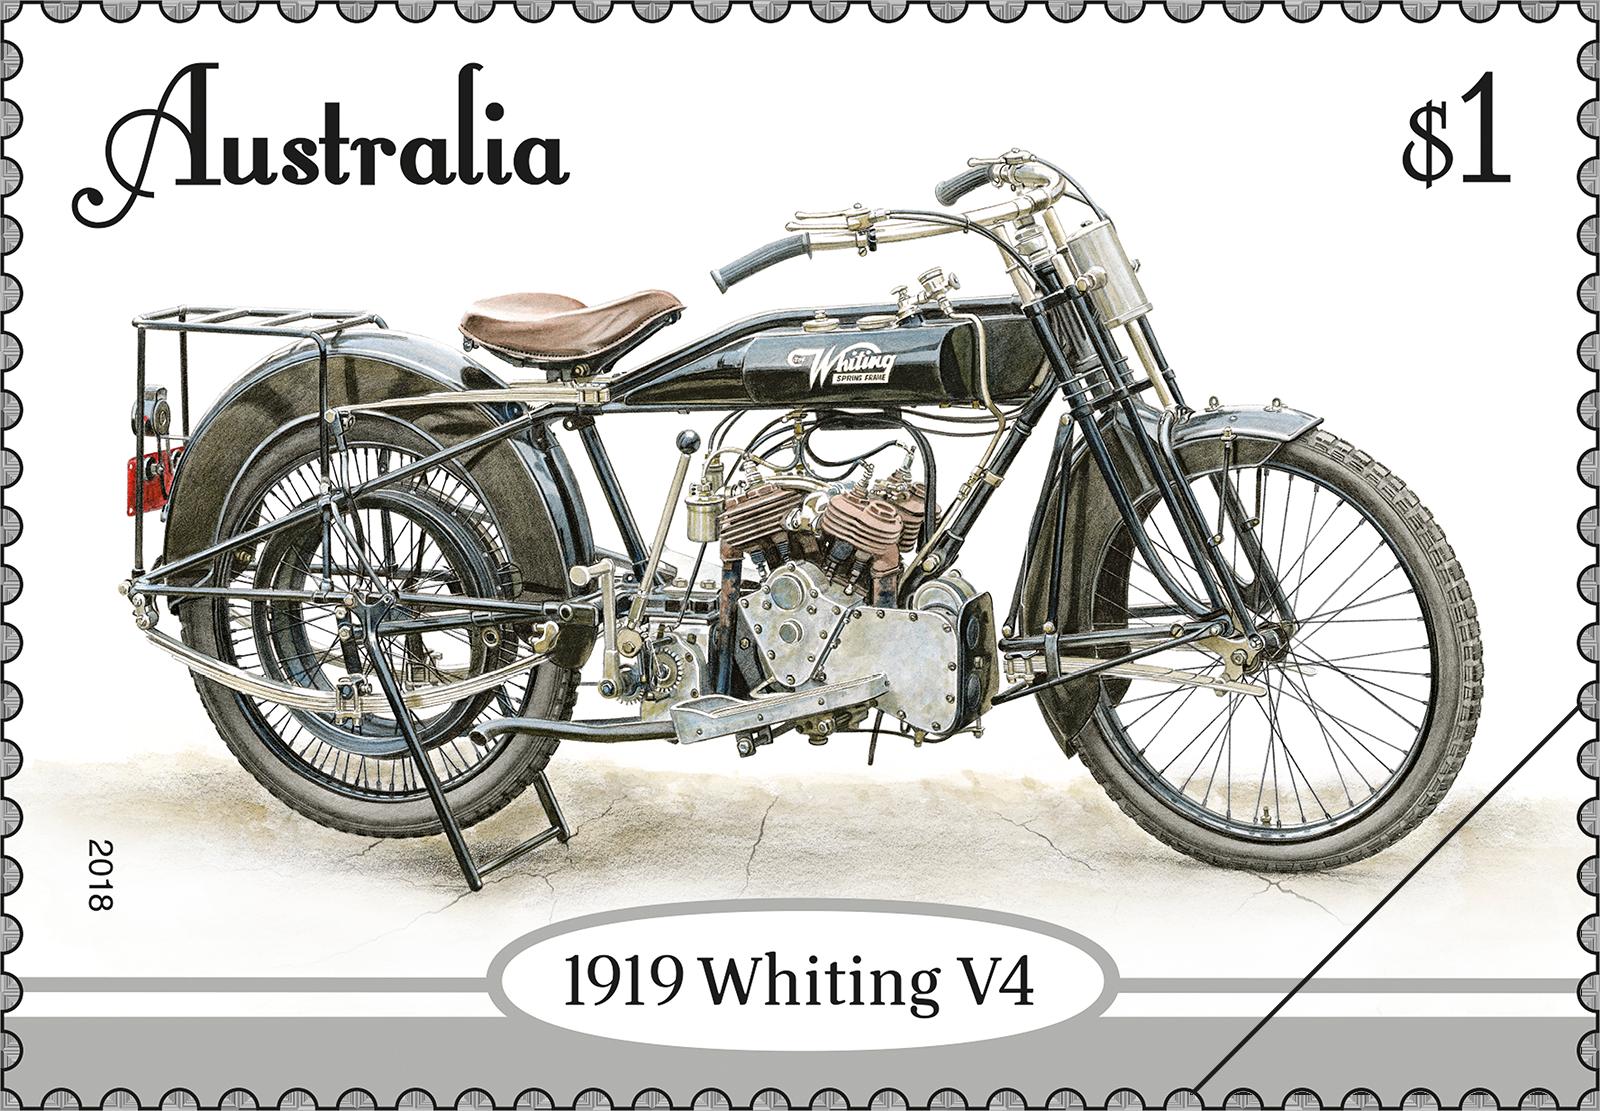 Vintage Motorcycles - Australia Post